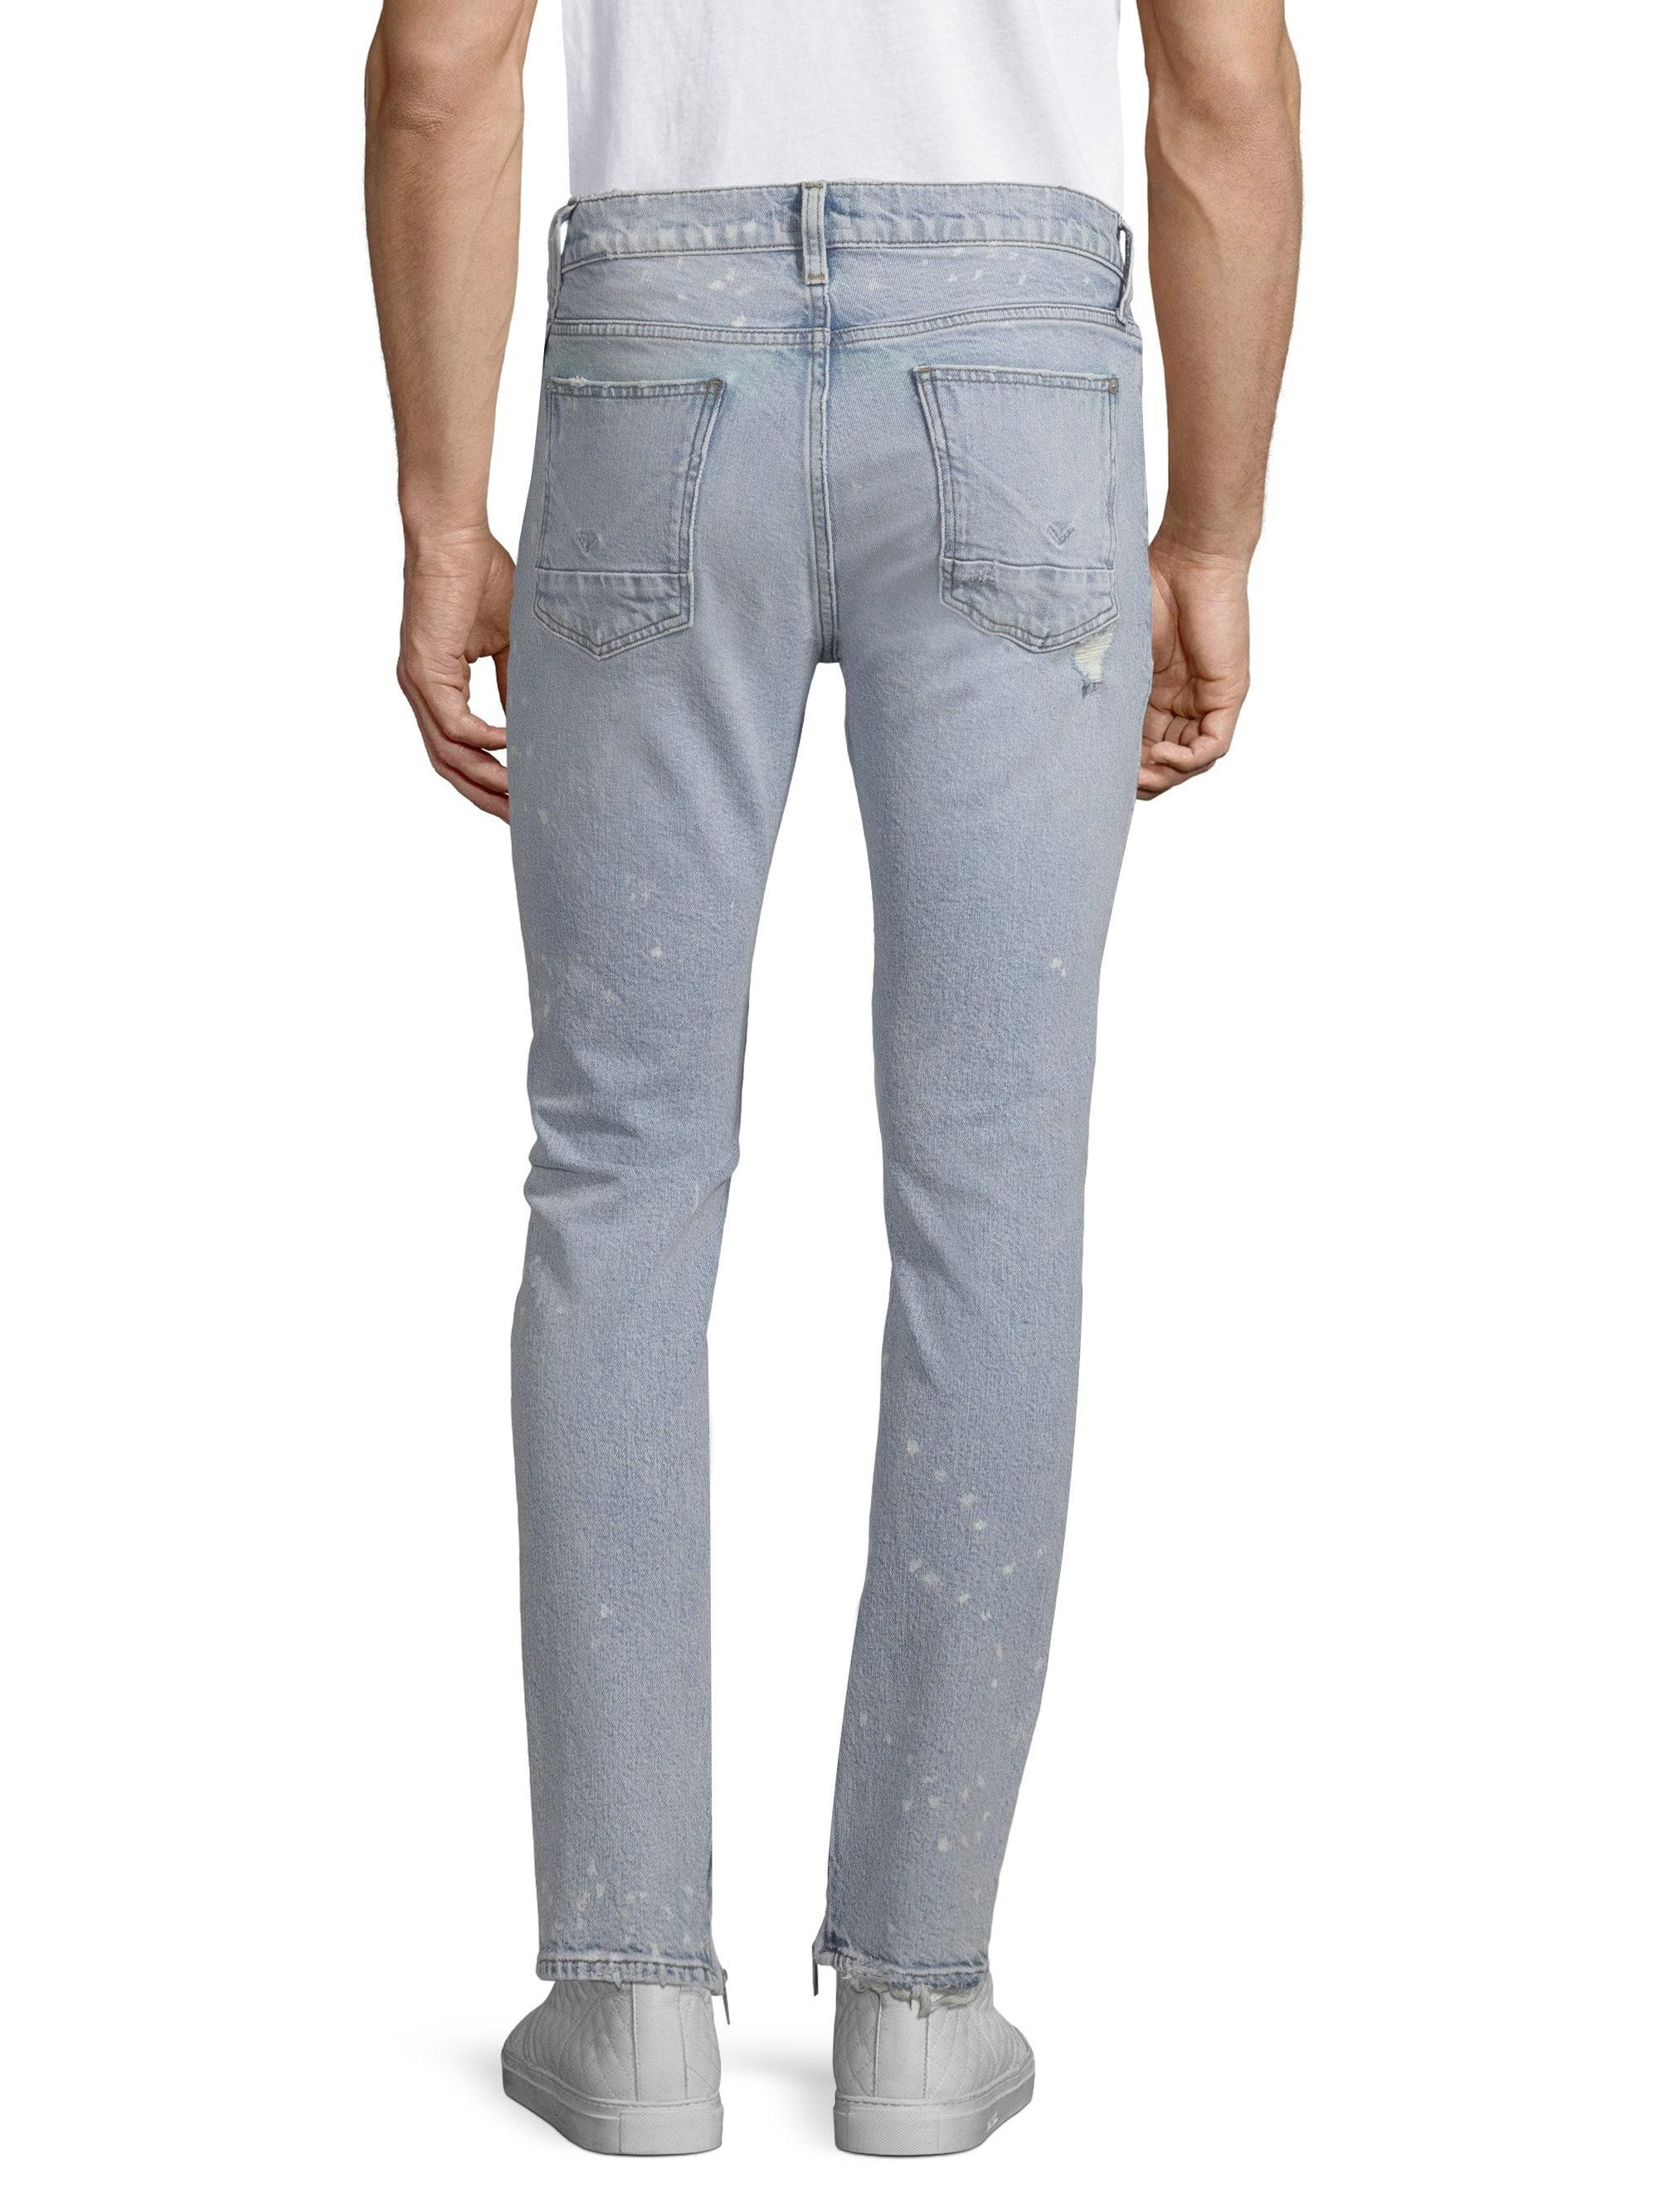 5ae00321288 Hudson - Blue Men's Vaughn Skinny Cotton Ankle Zip Jeans - Echo Park - Size  34. View fullscreen